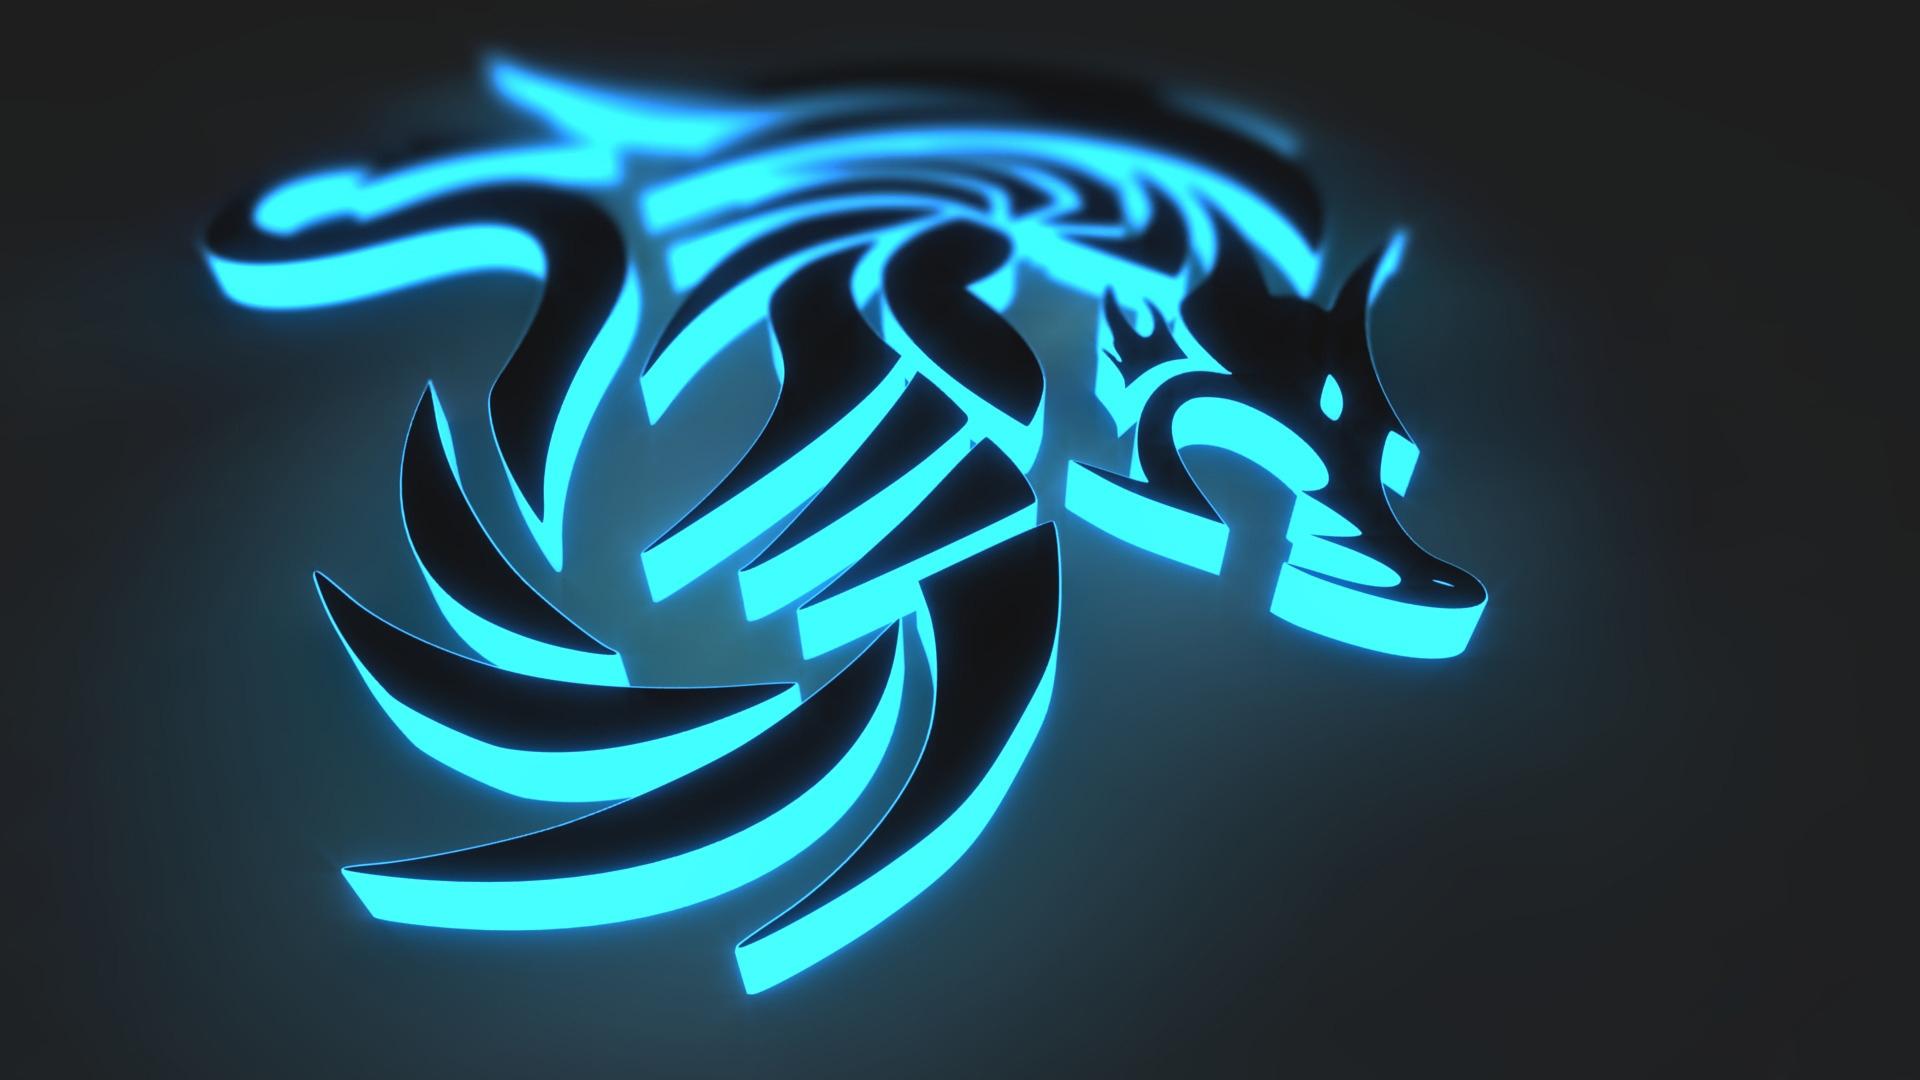 dragon emblem images reverse